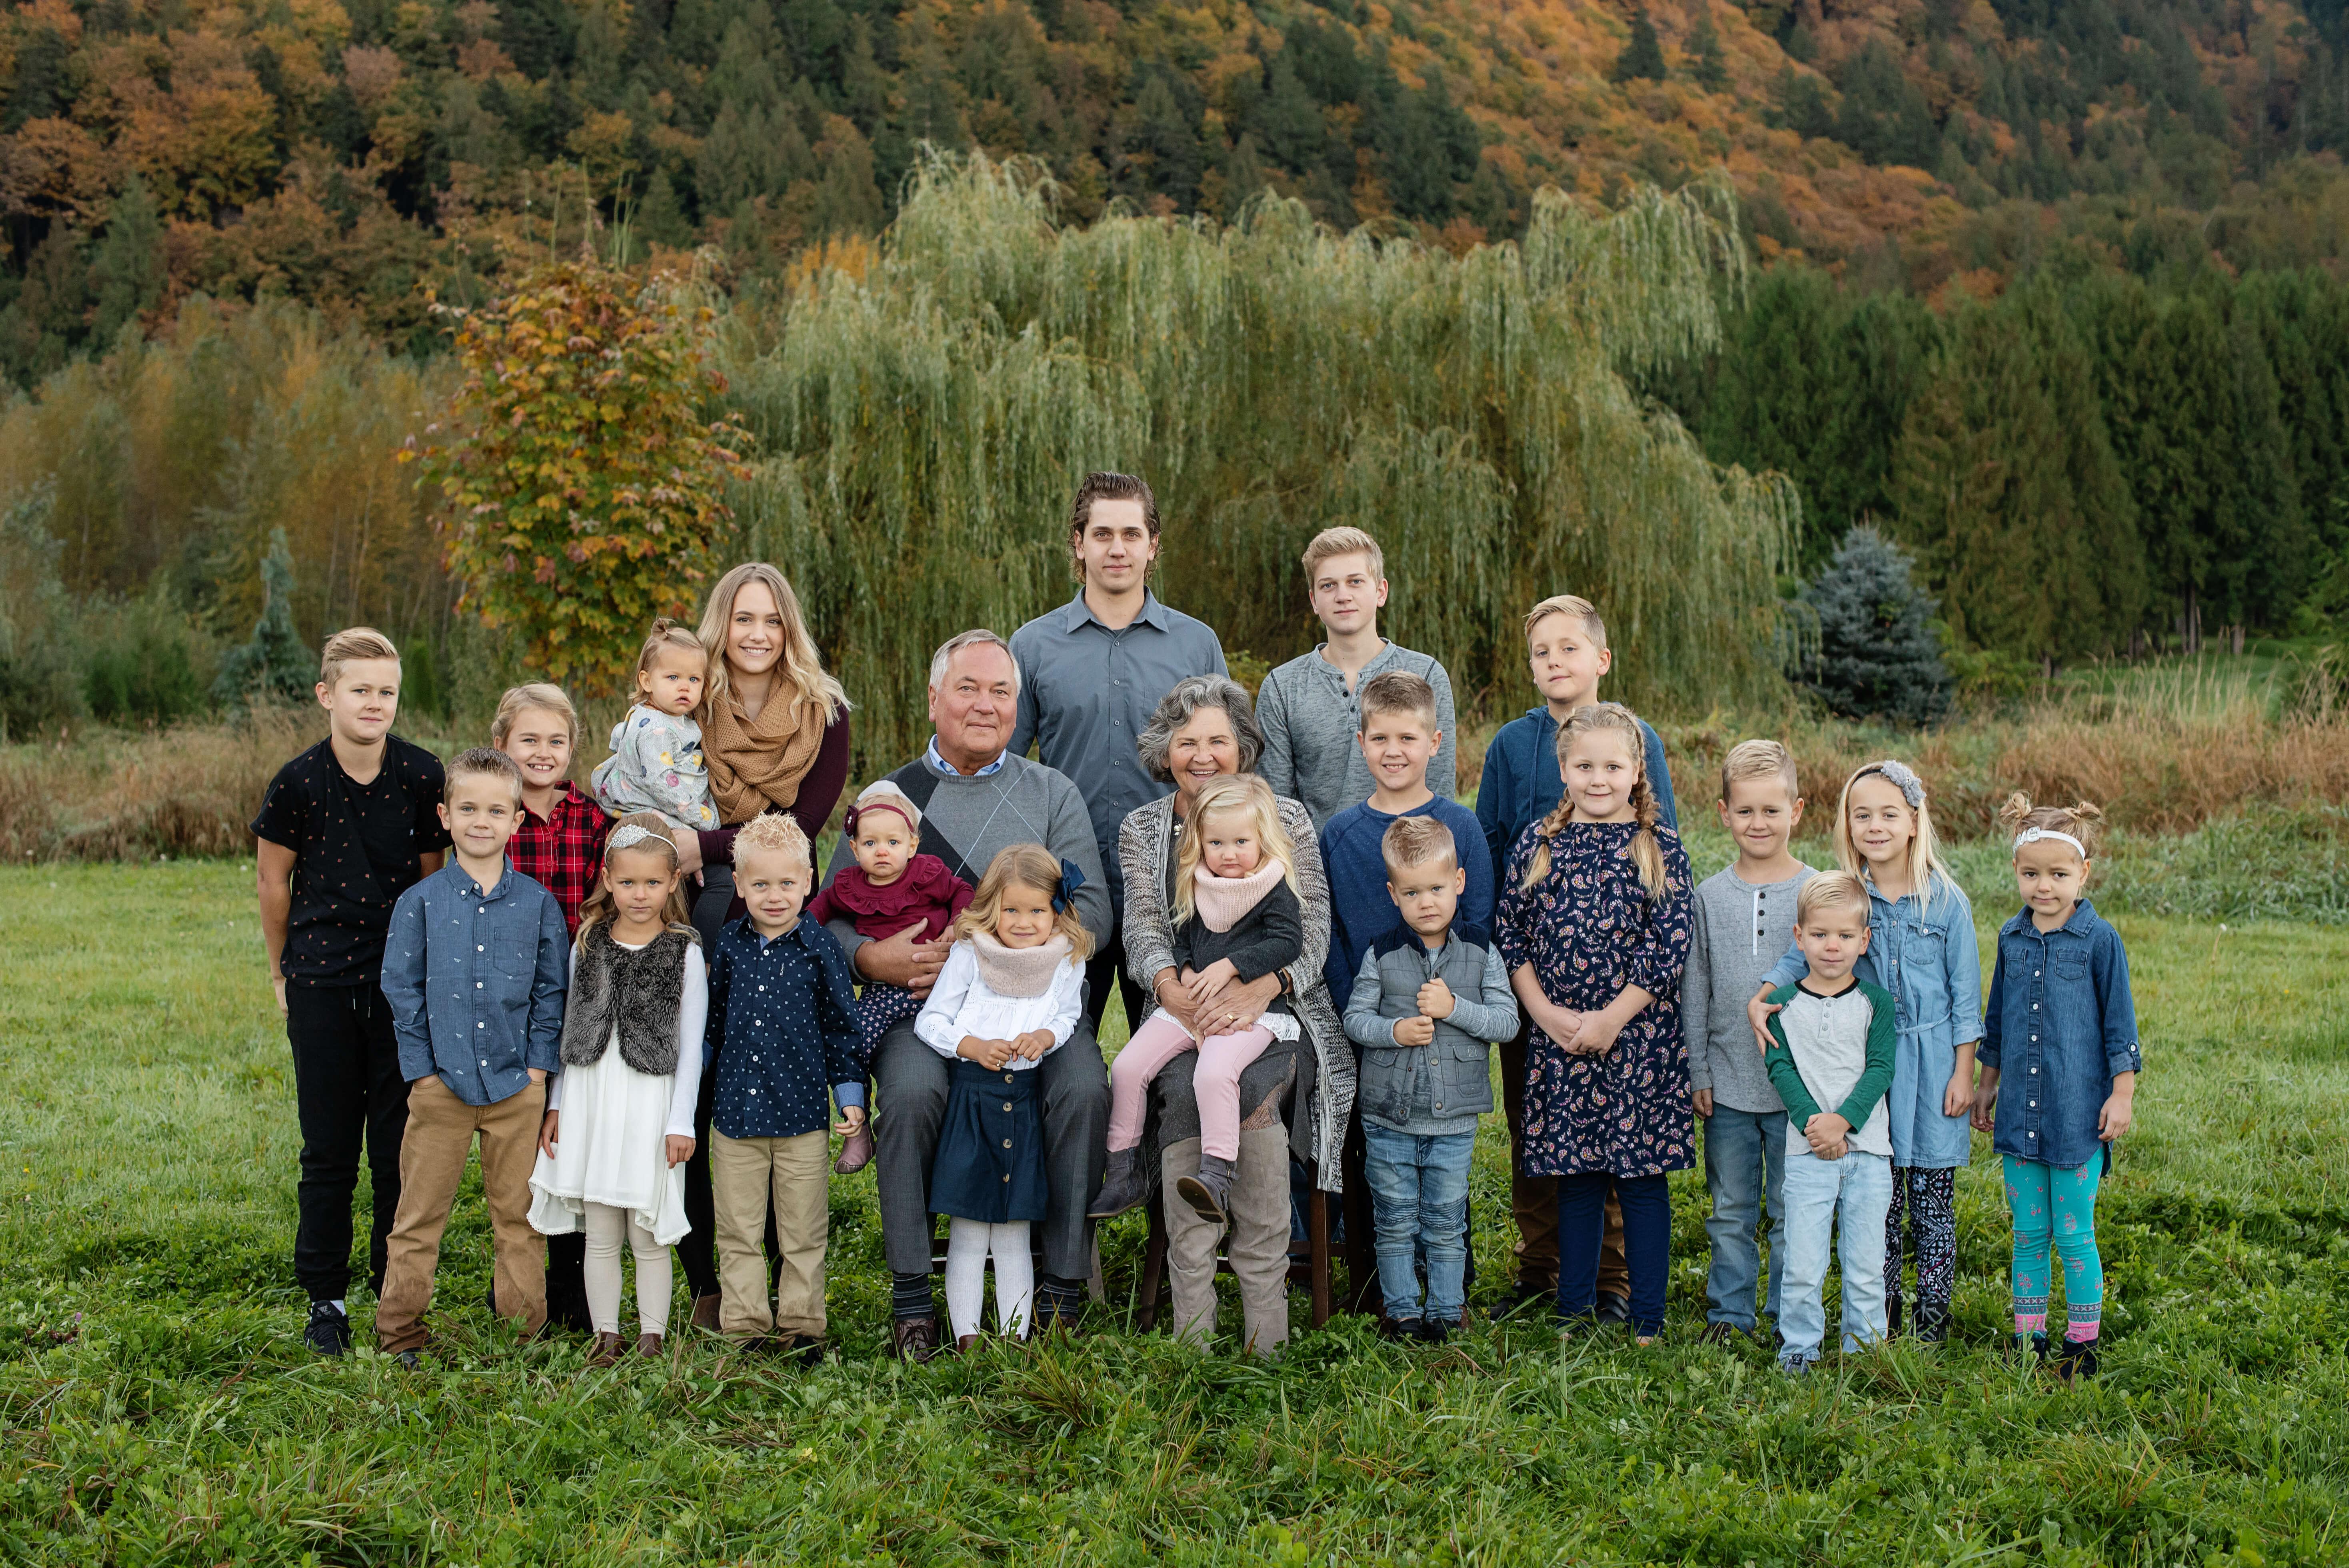 Chilliwack Extended Family Photographer